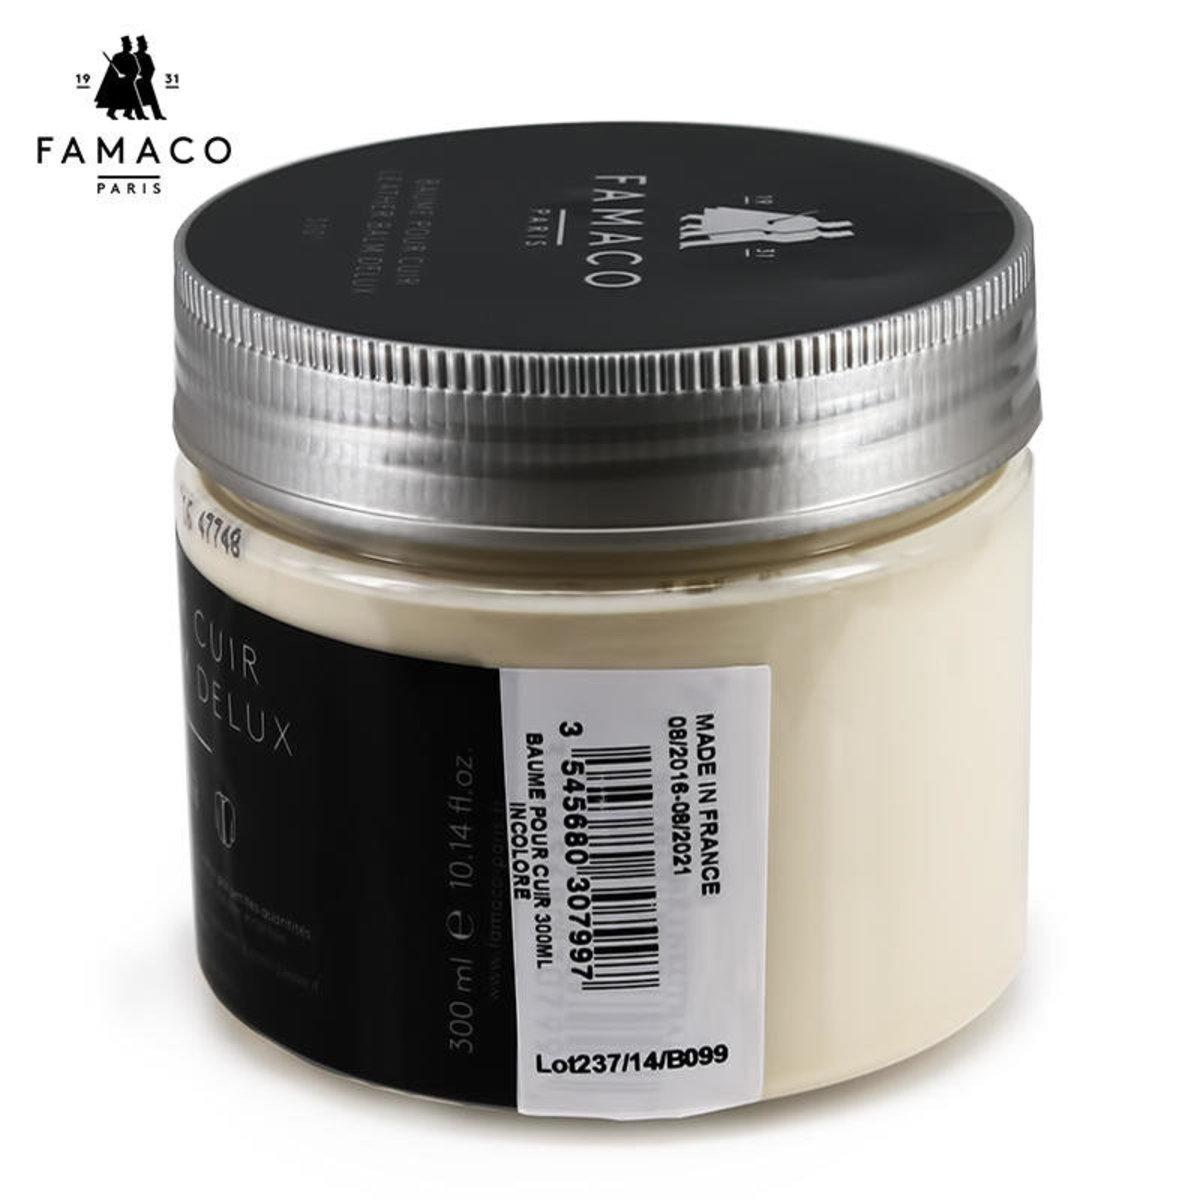 Famaco Nourishing Leather Furniture Cream (incolour) 300ml